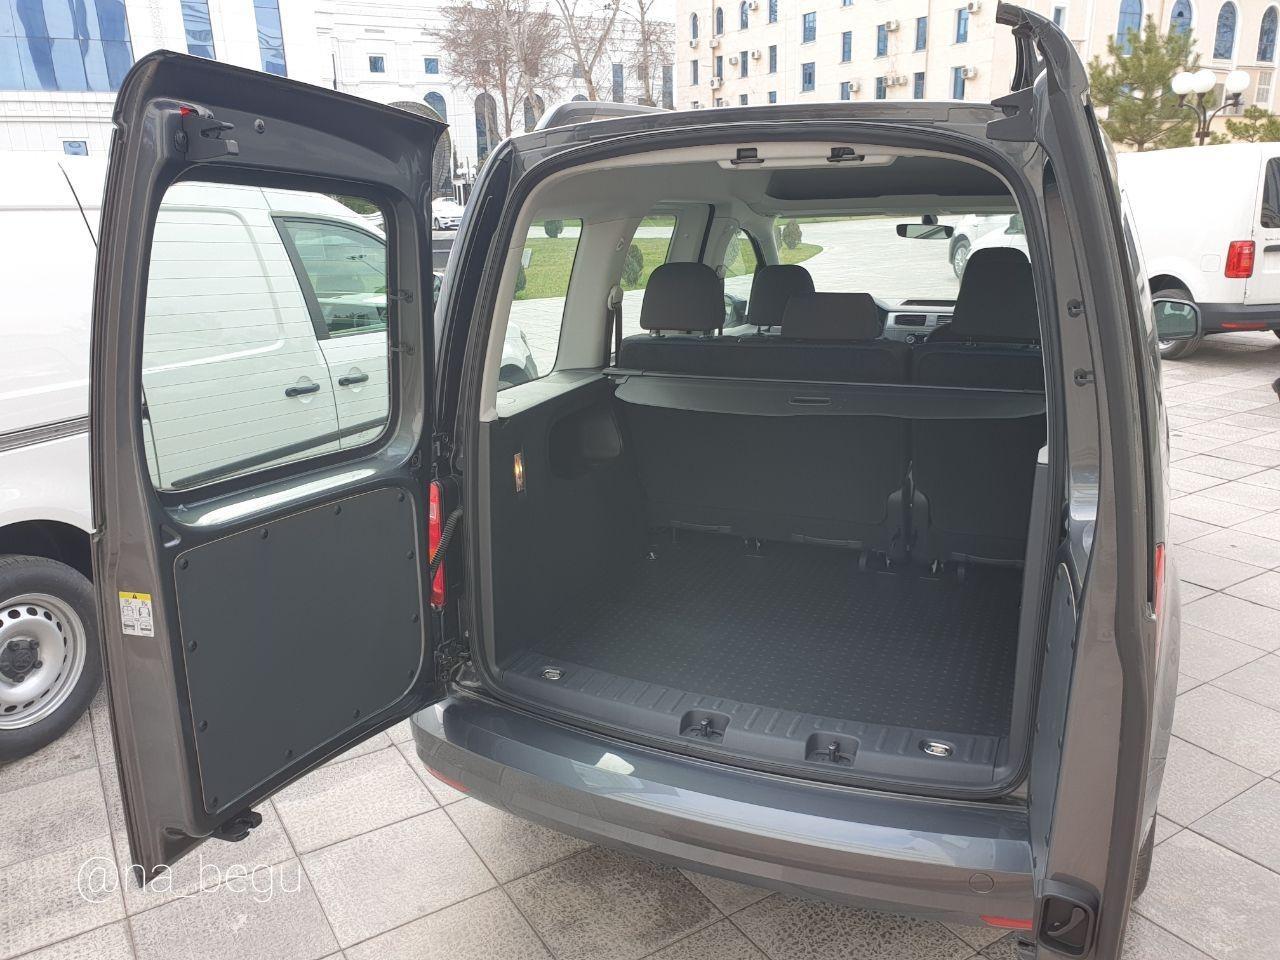 Volkswagen Caddy Narxi - Цена на Кэдди в Узбекистане - 16